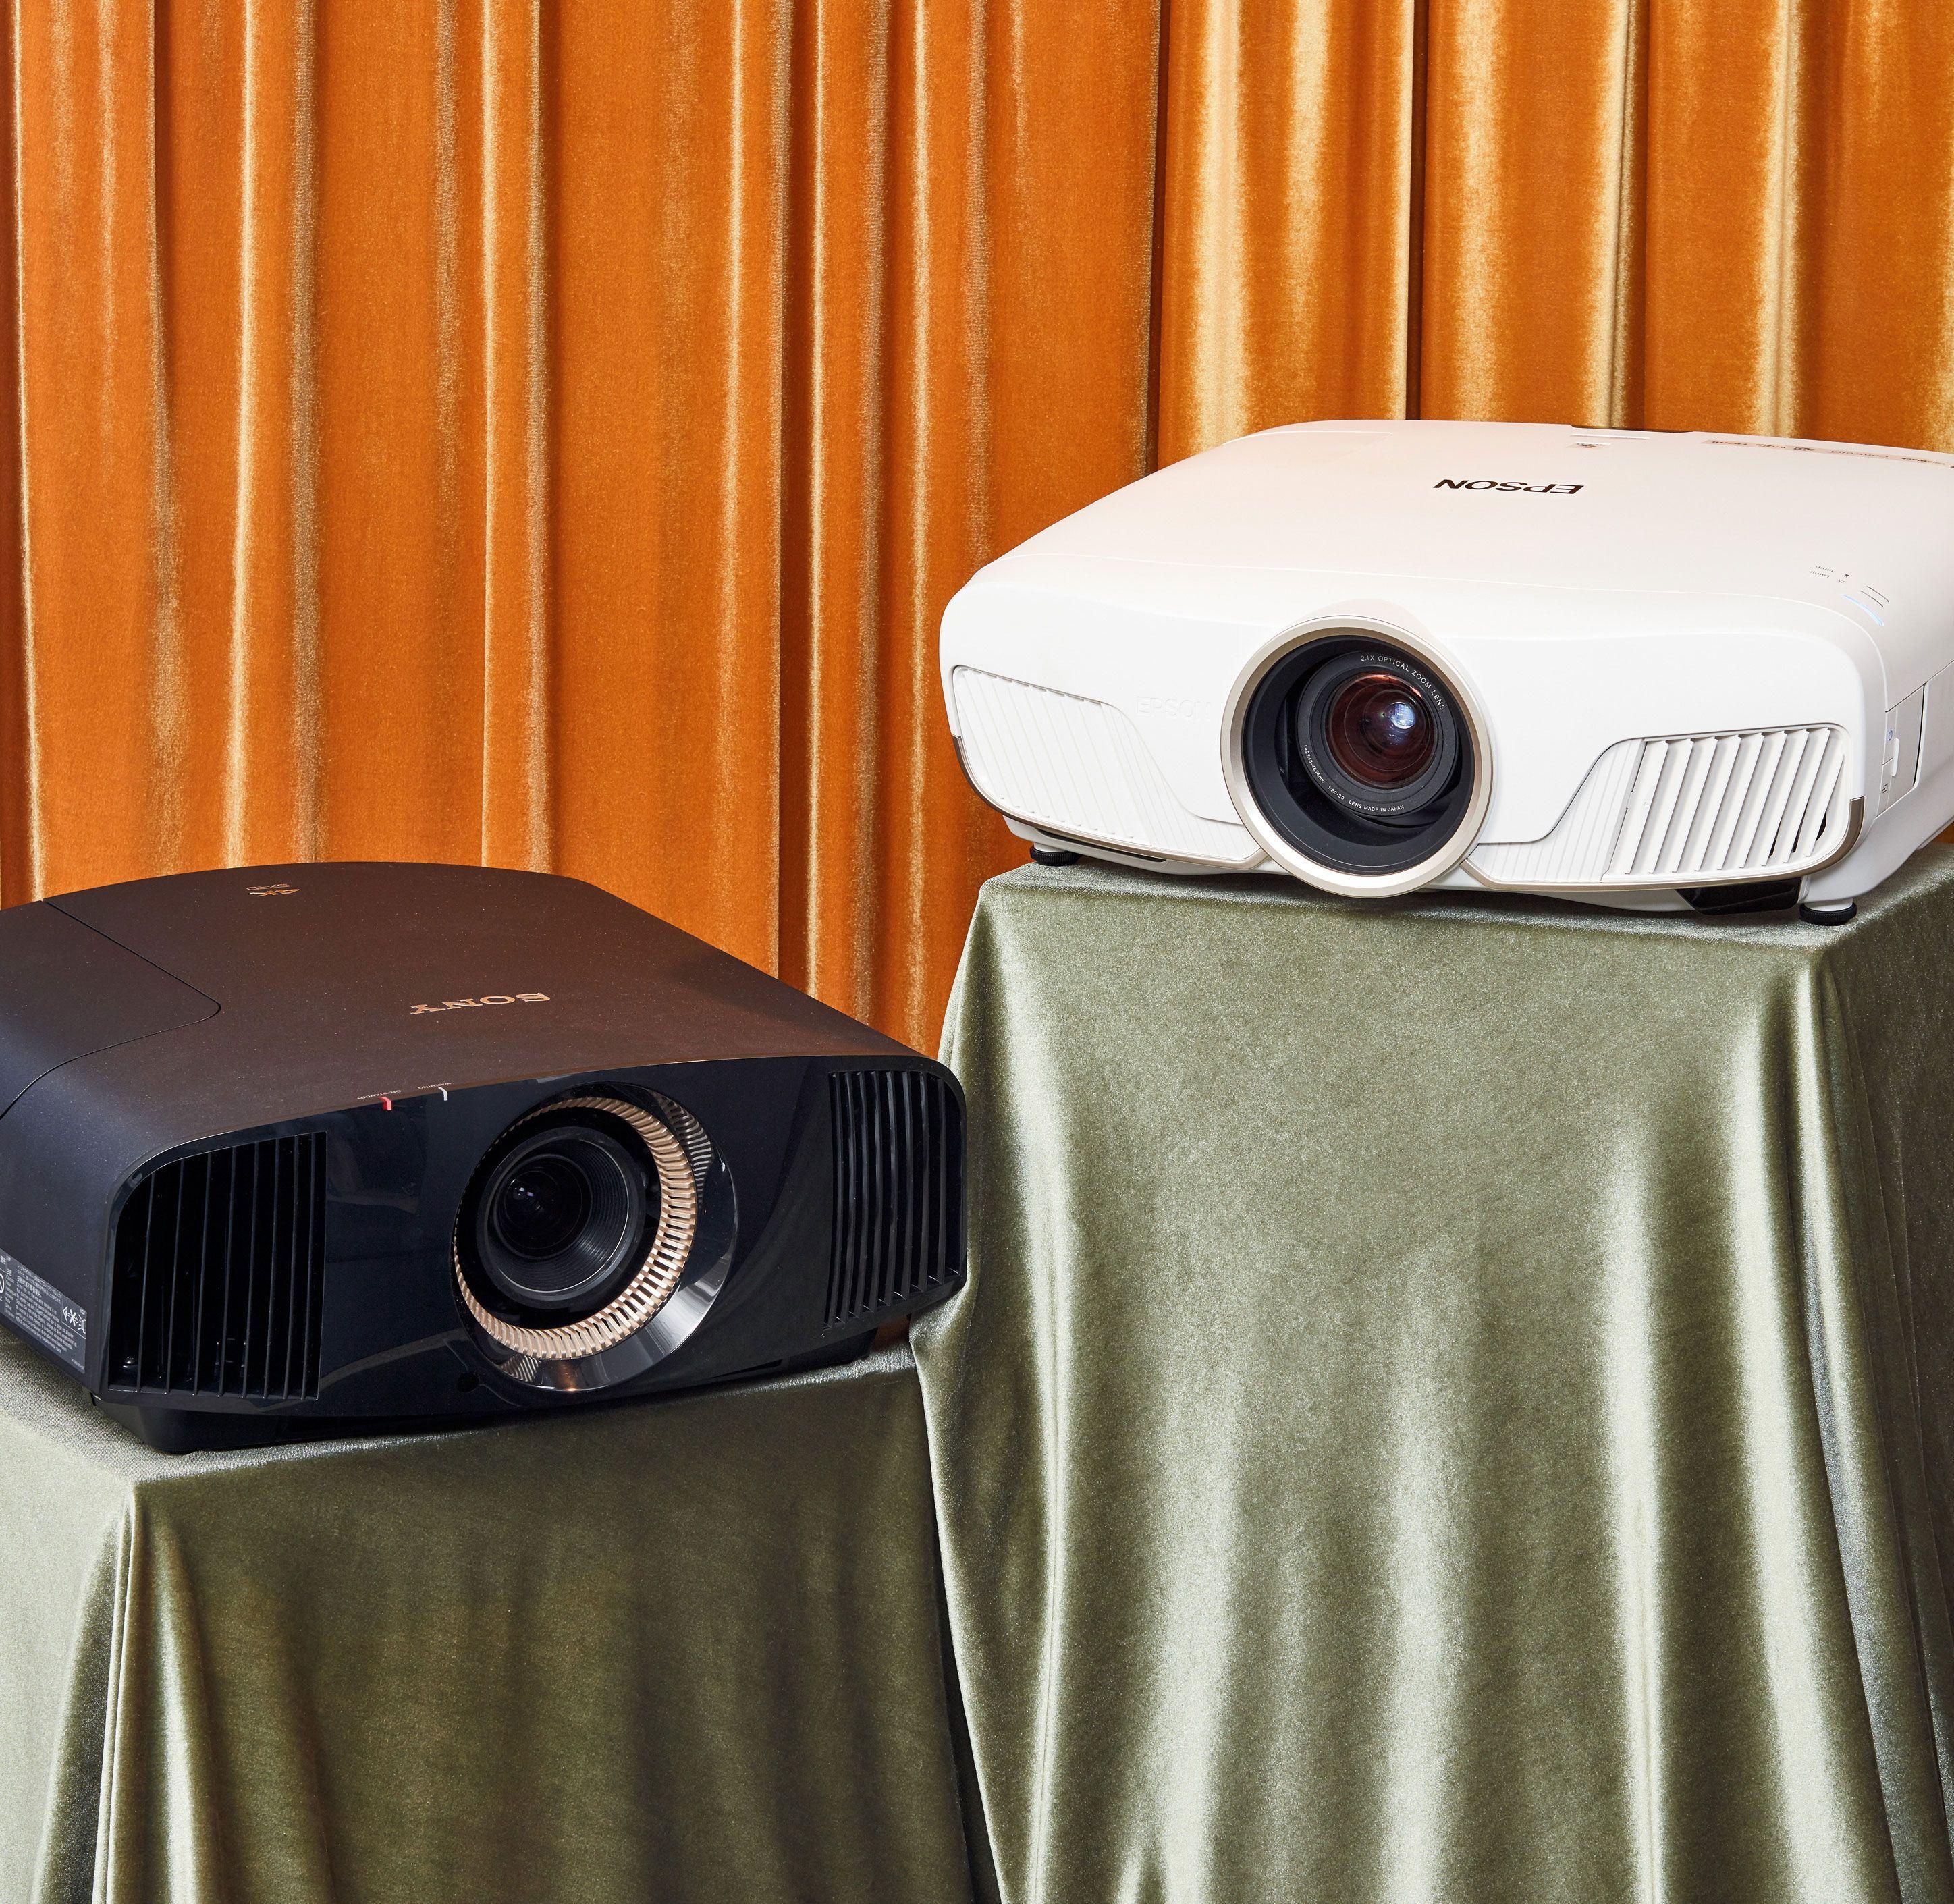 home theater wiring articles 2 killer projectors for your home theater hometheater wiringarticles [ 2895 x 2821 Pixel ]